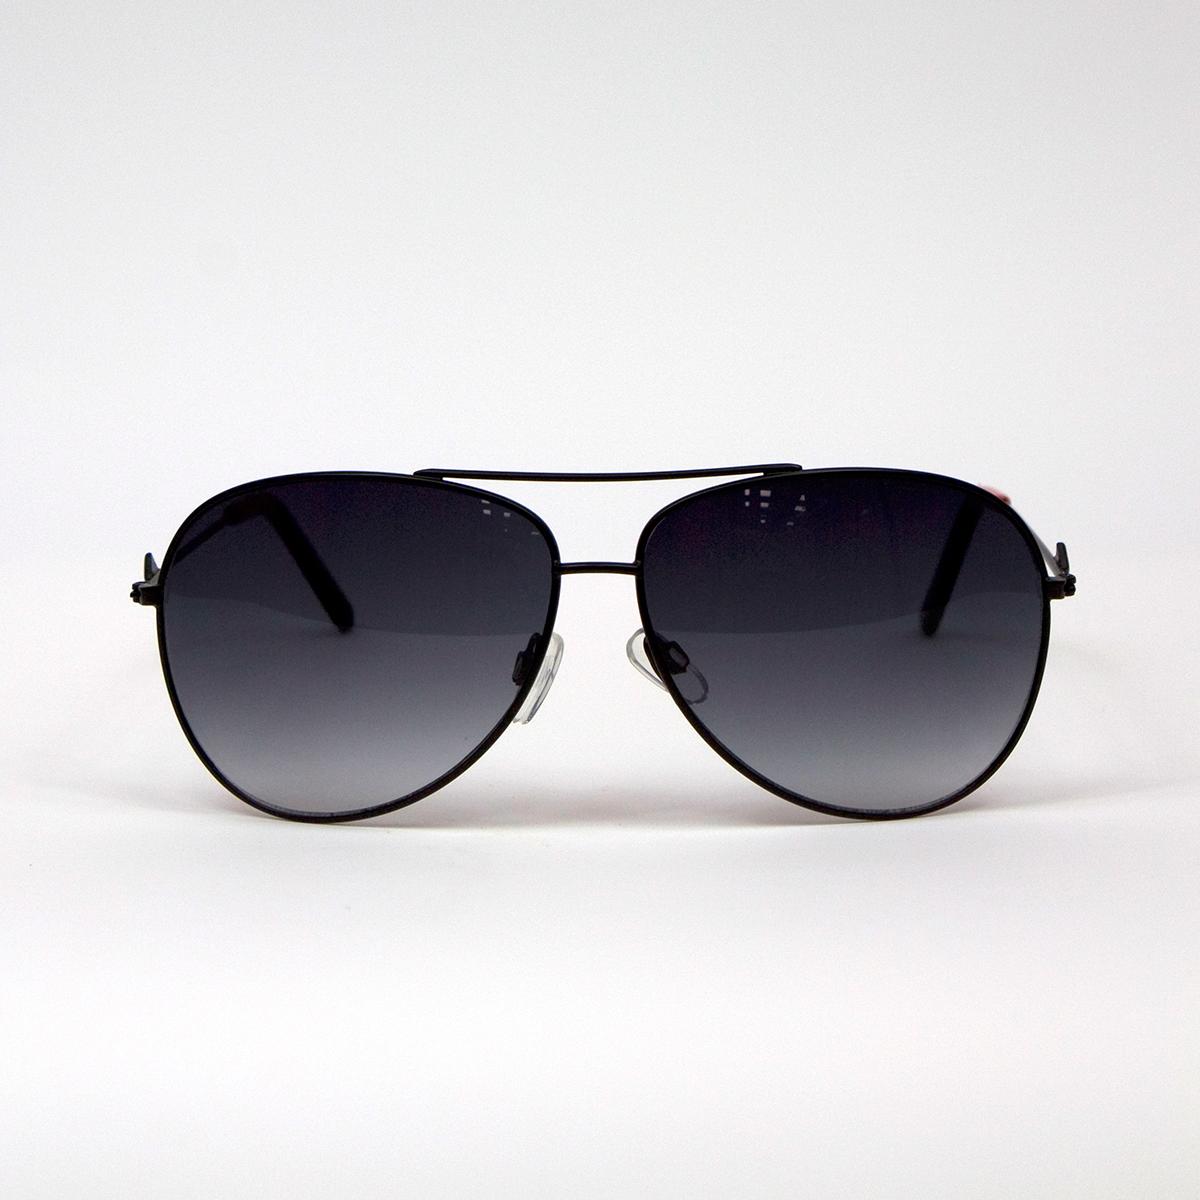 Stylish goggles clipart svg black and white stock Sunglasses Clip Art Men Very stylish | Glasses | Sports ... svg black and white stock